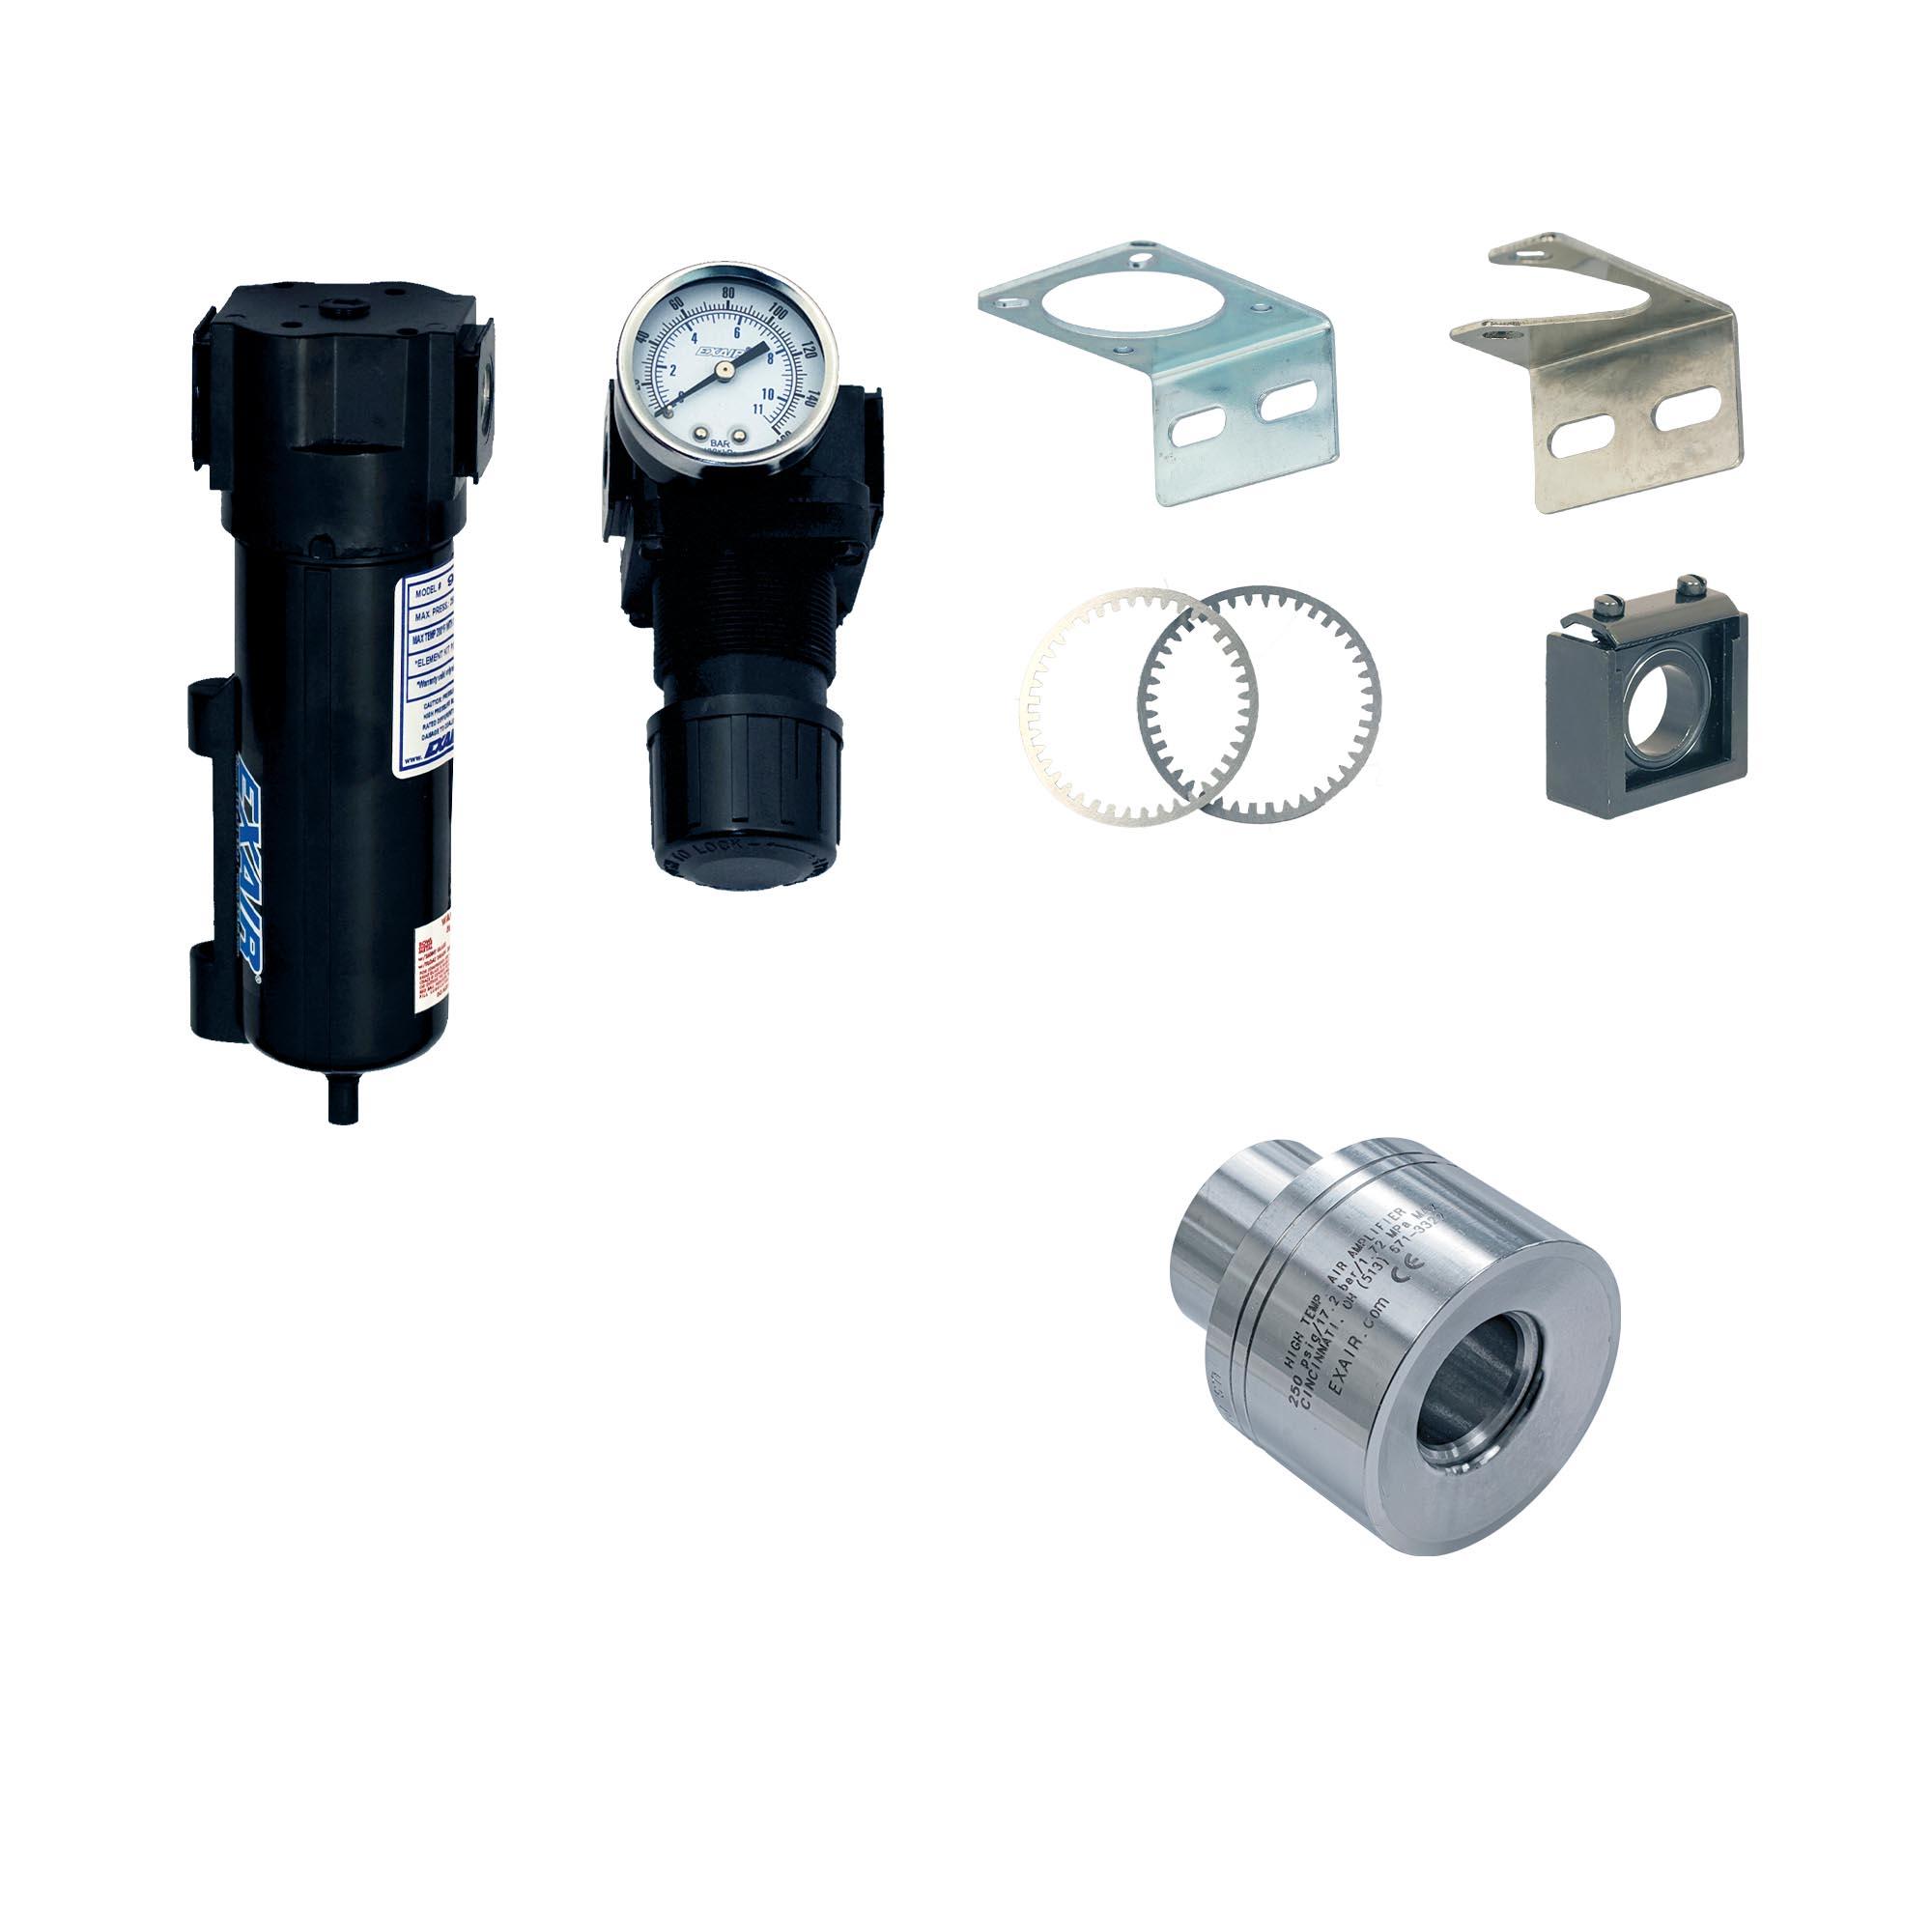 "Model 121221 1-1/4"" Alum. High Temperature Air Amplifier Kit"